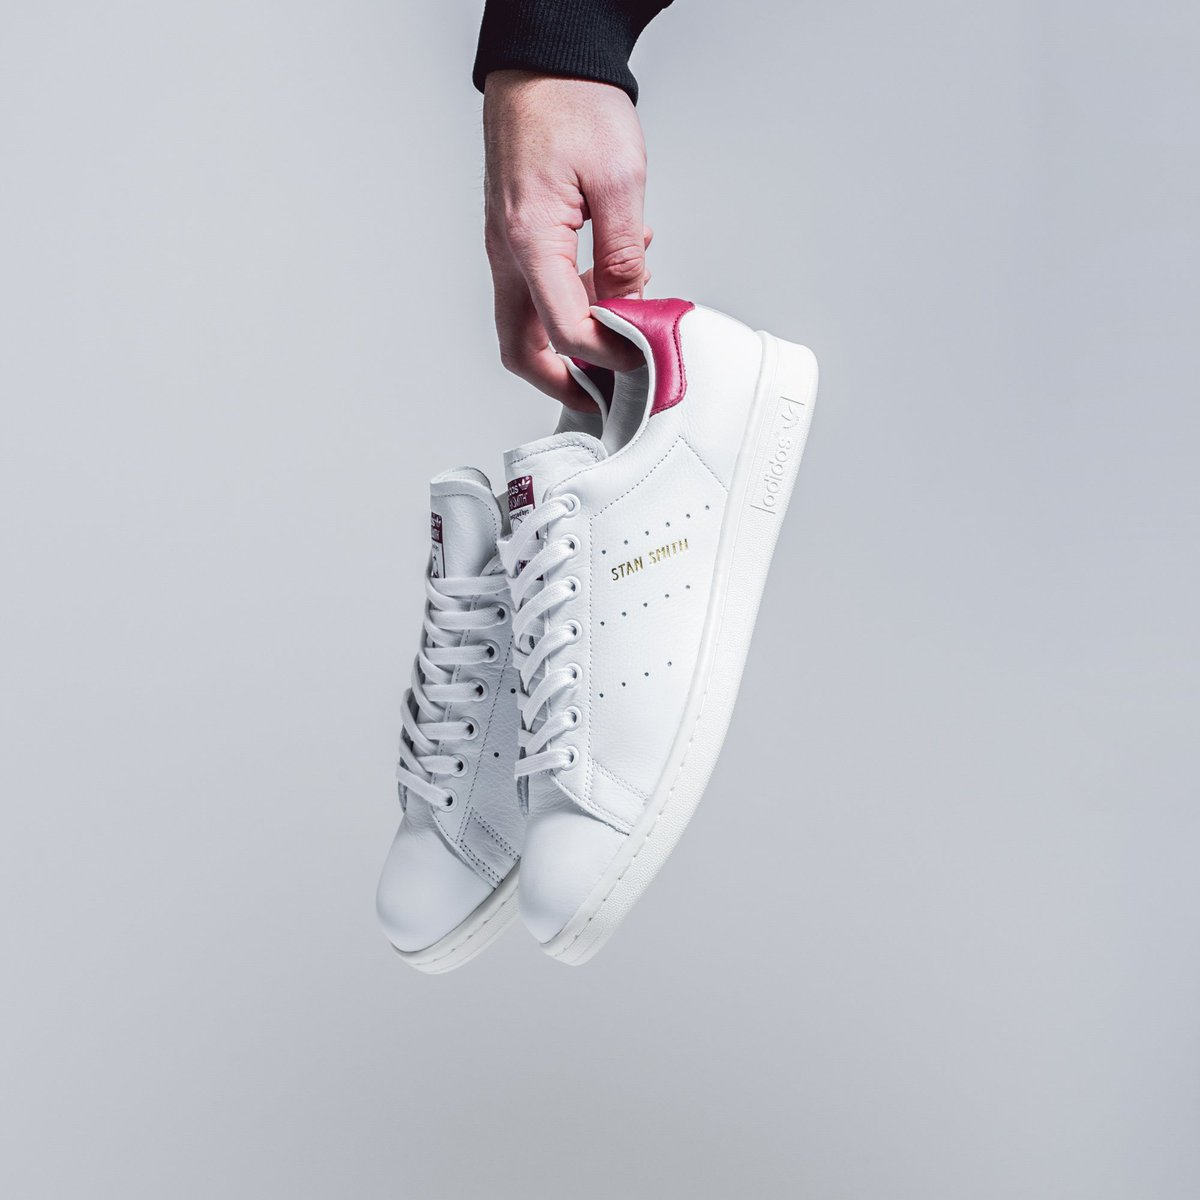 adidas uk yeezy calabasas adidas stan smith black ioffer review